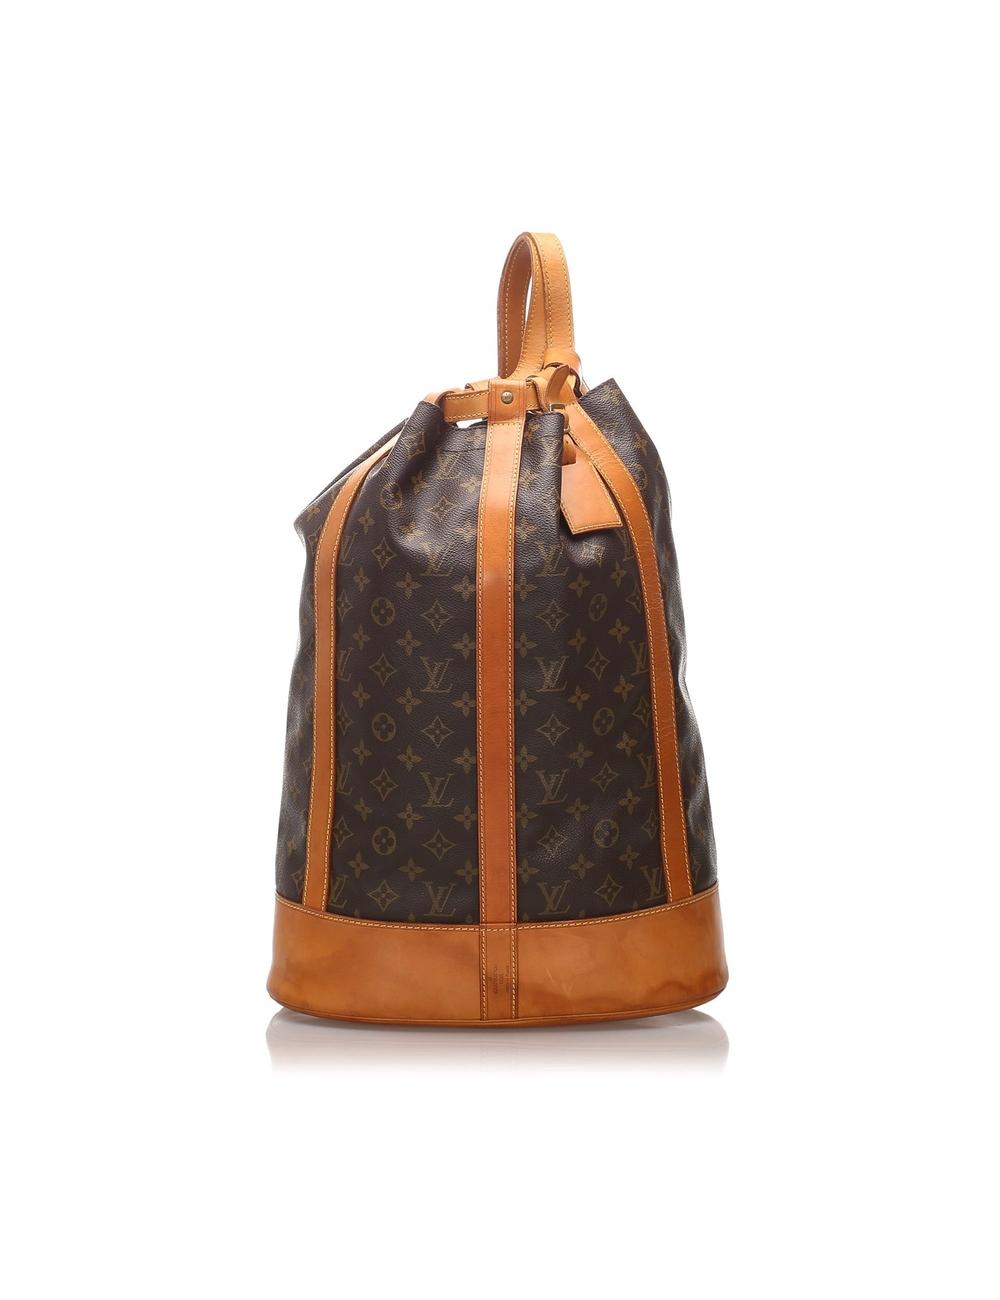 Randonnee的特點是會標帆布主體,帶有皮革飾邊,一條平皮帶,一個頂部抽繩封口和一個內部拉鍊袋。 型號:M42244 貨號:A11903 測量: 長度:33cm 寬:48cm 深度:18cm 原產